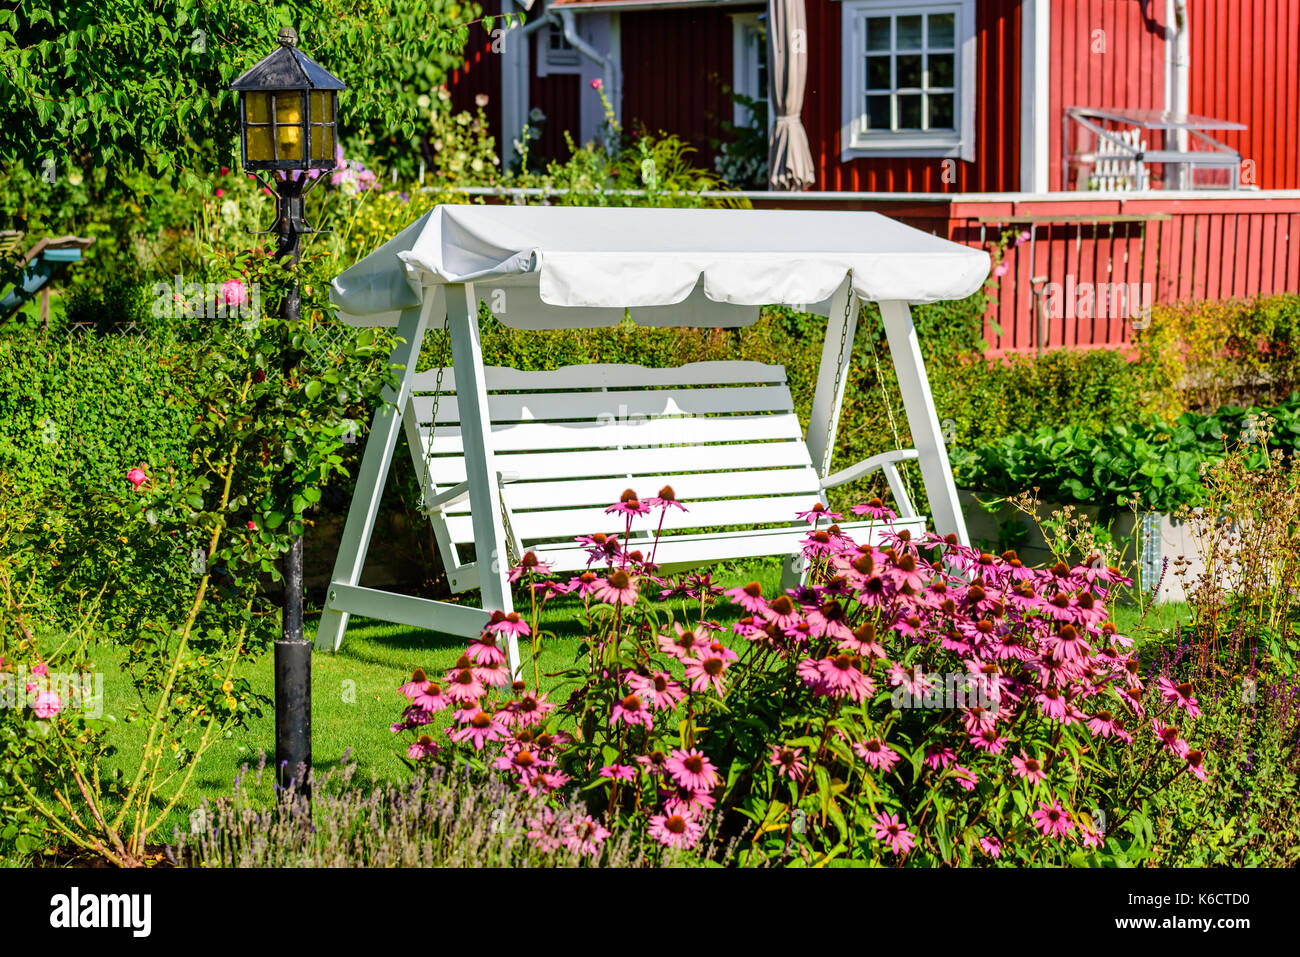 Empty White Canopy Swing Or Patio Swing In Green Flower Garden. Lamppost  And Flowers In